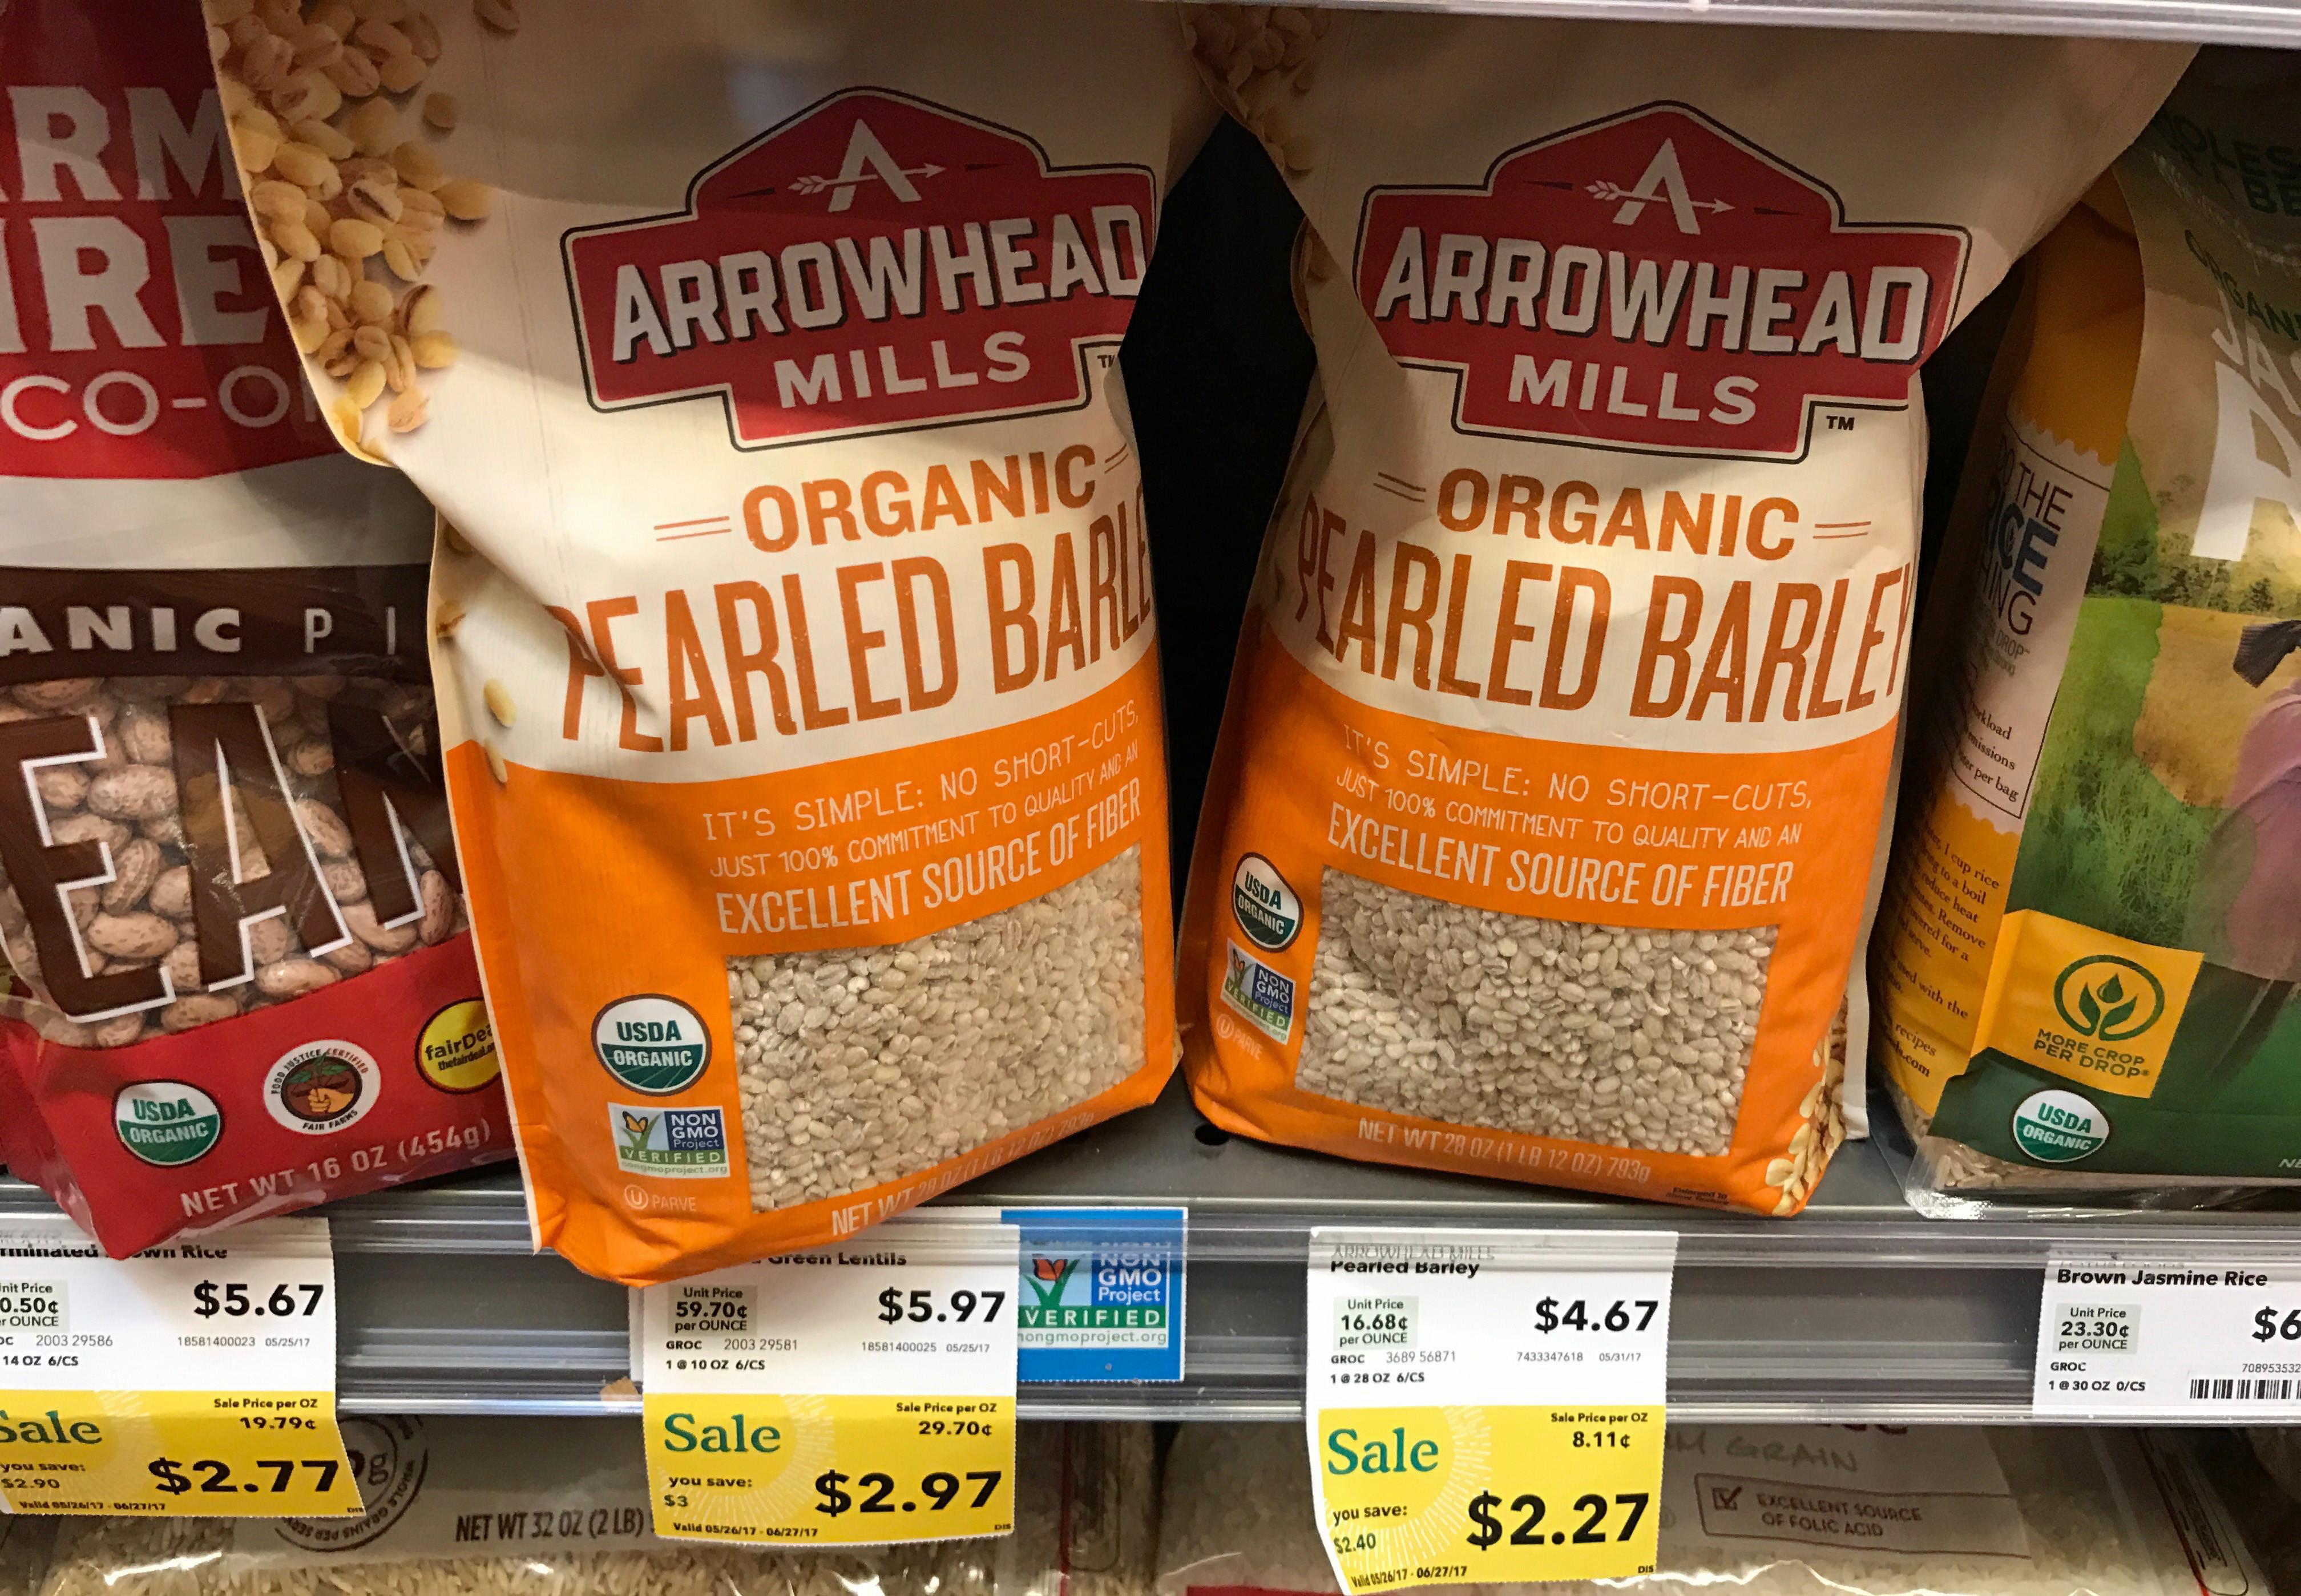 arrowheadmillspearledbarley